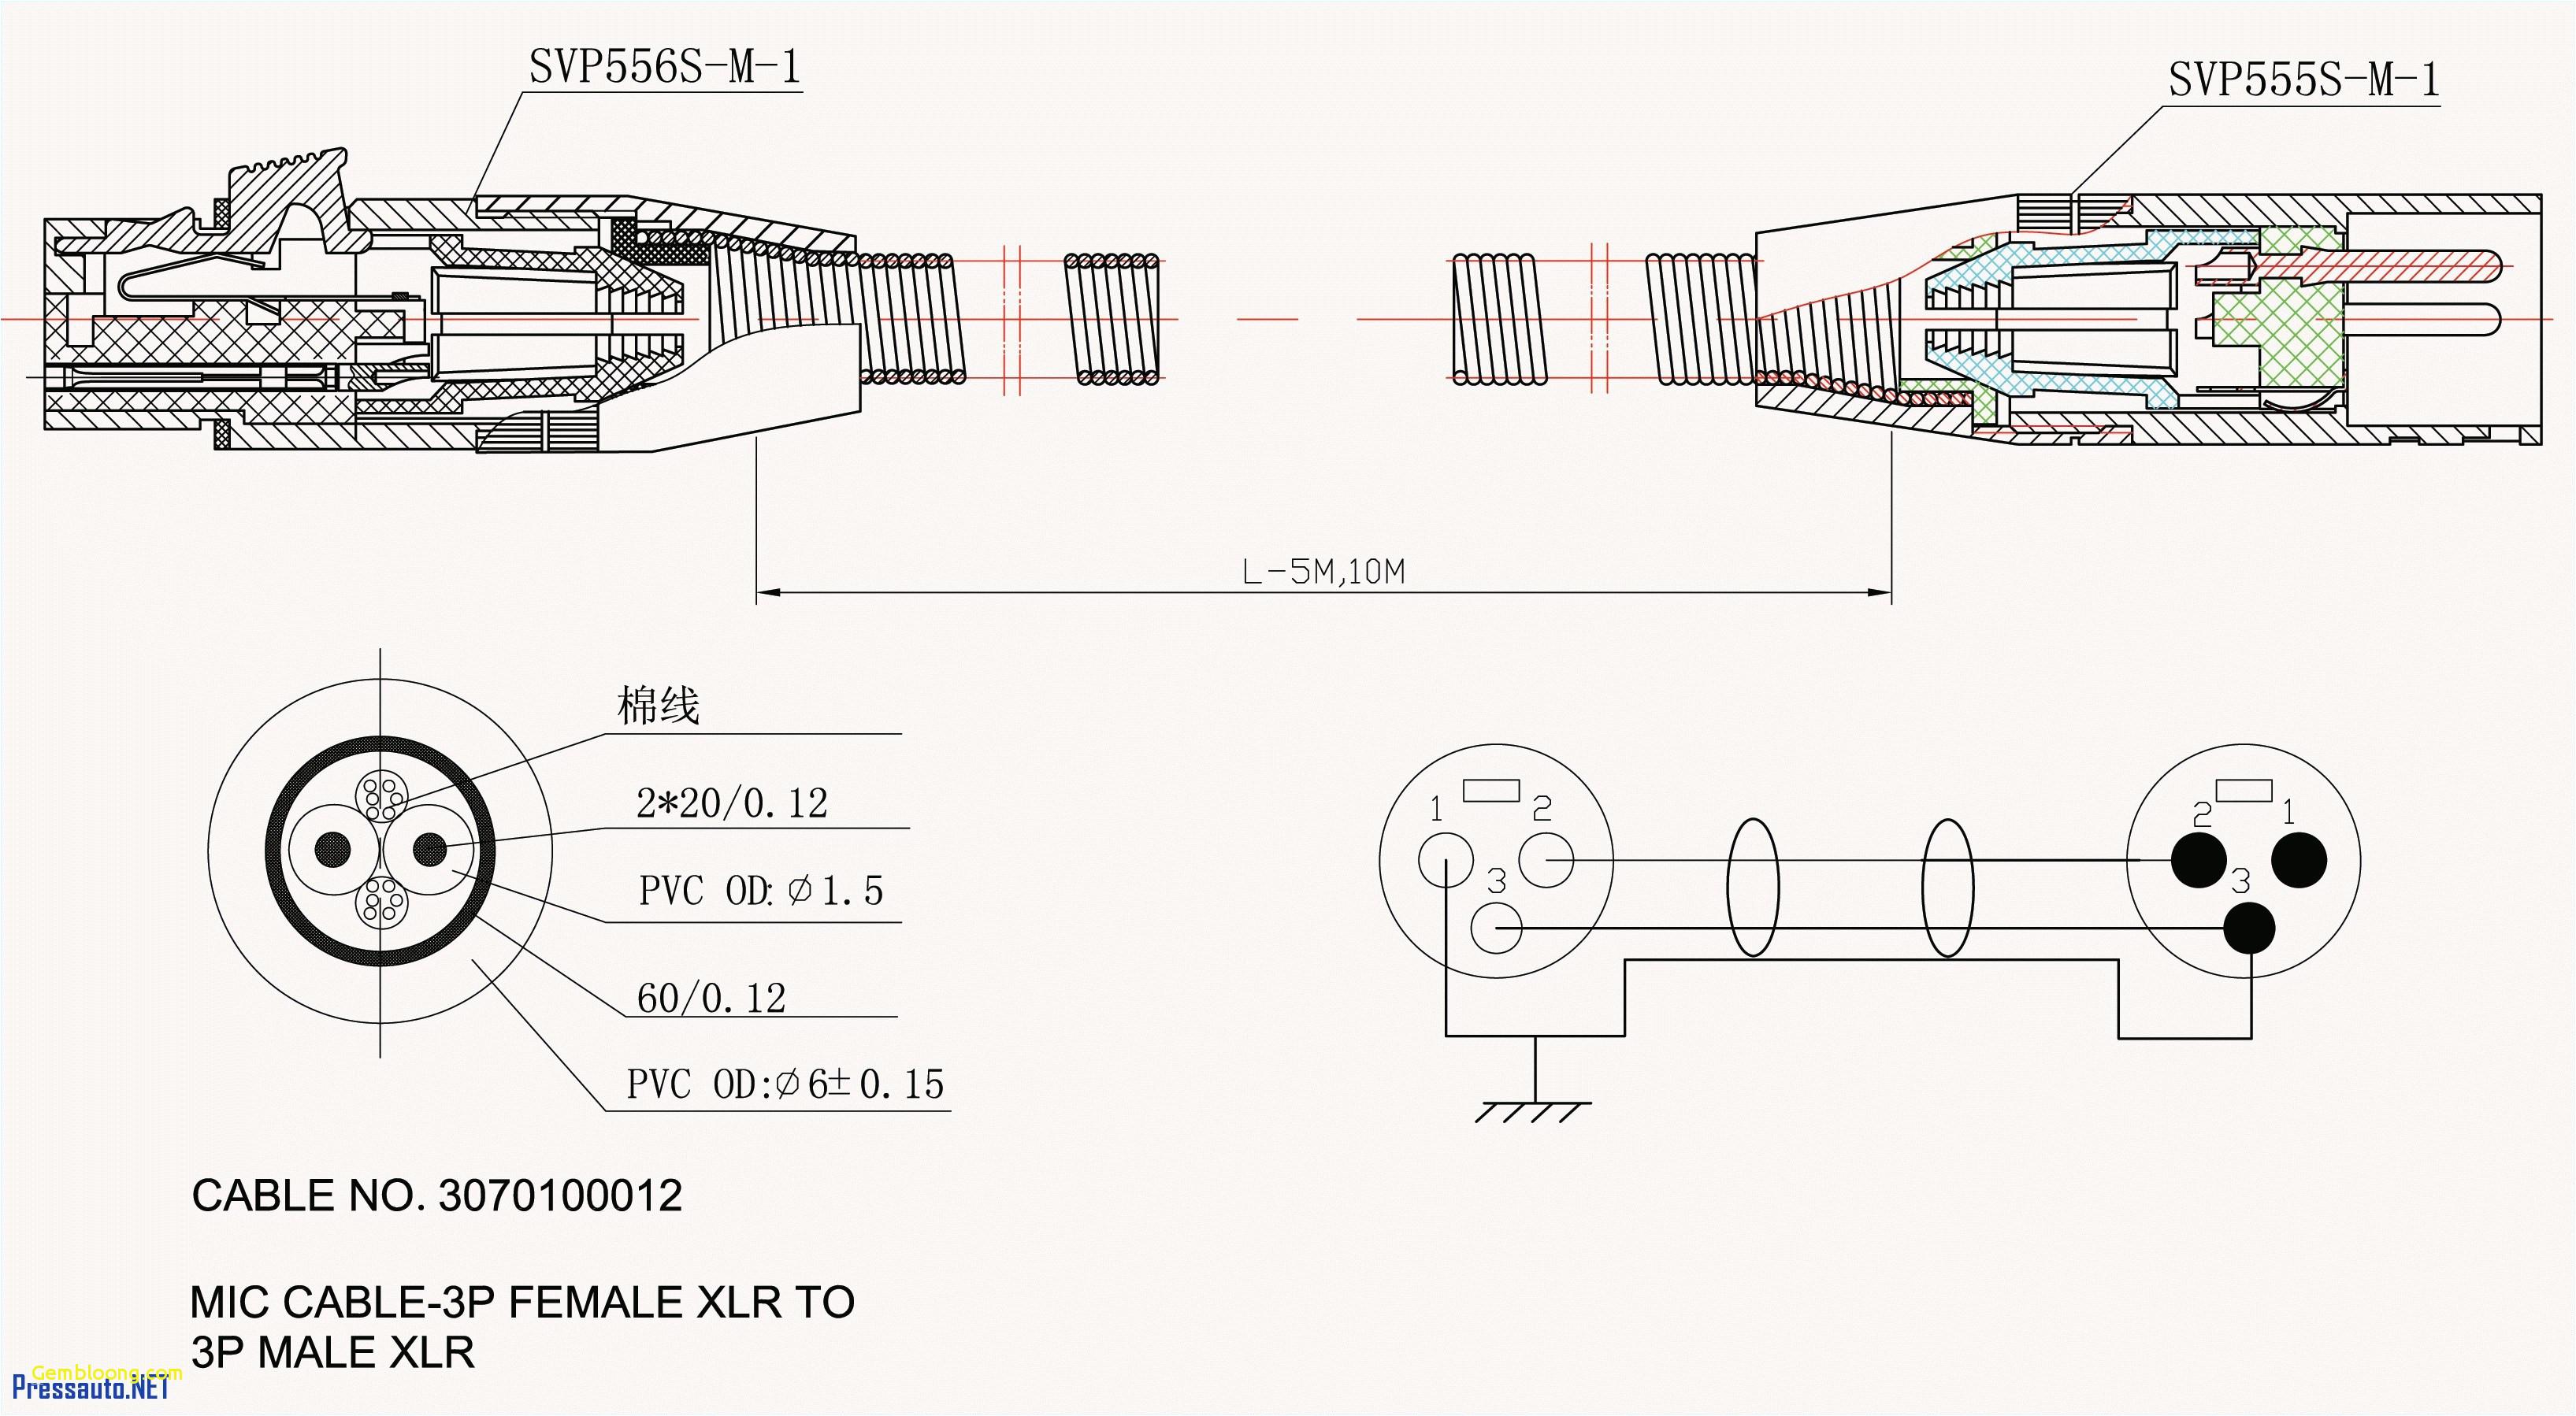 c13 wiring diagram wiring library c10 wiring diagram bmw e36 wiring diagrams circuit diagram schema c13